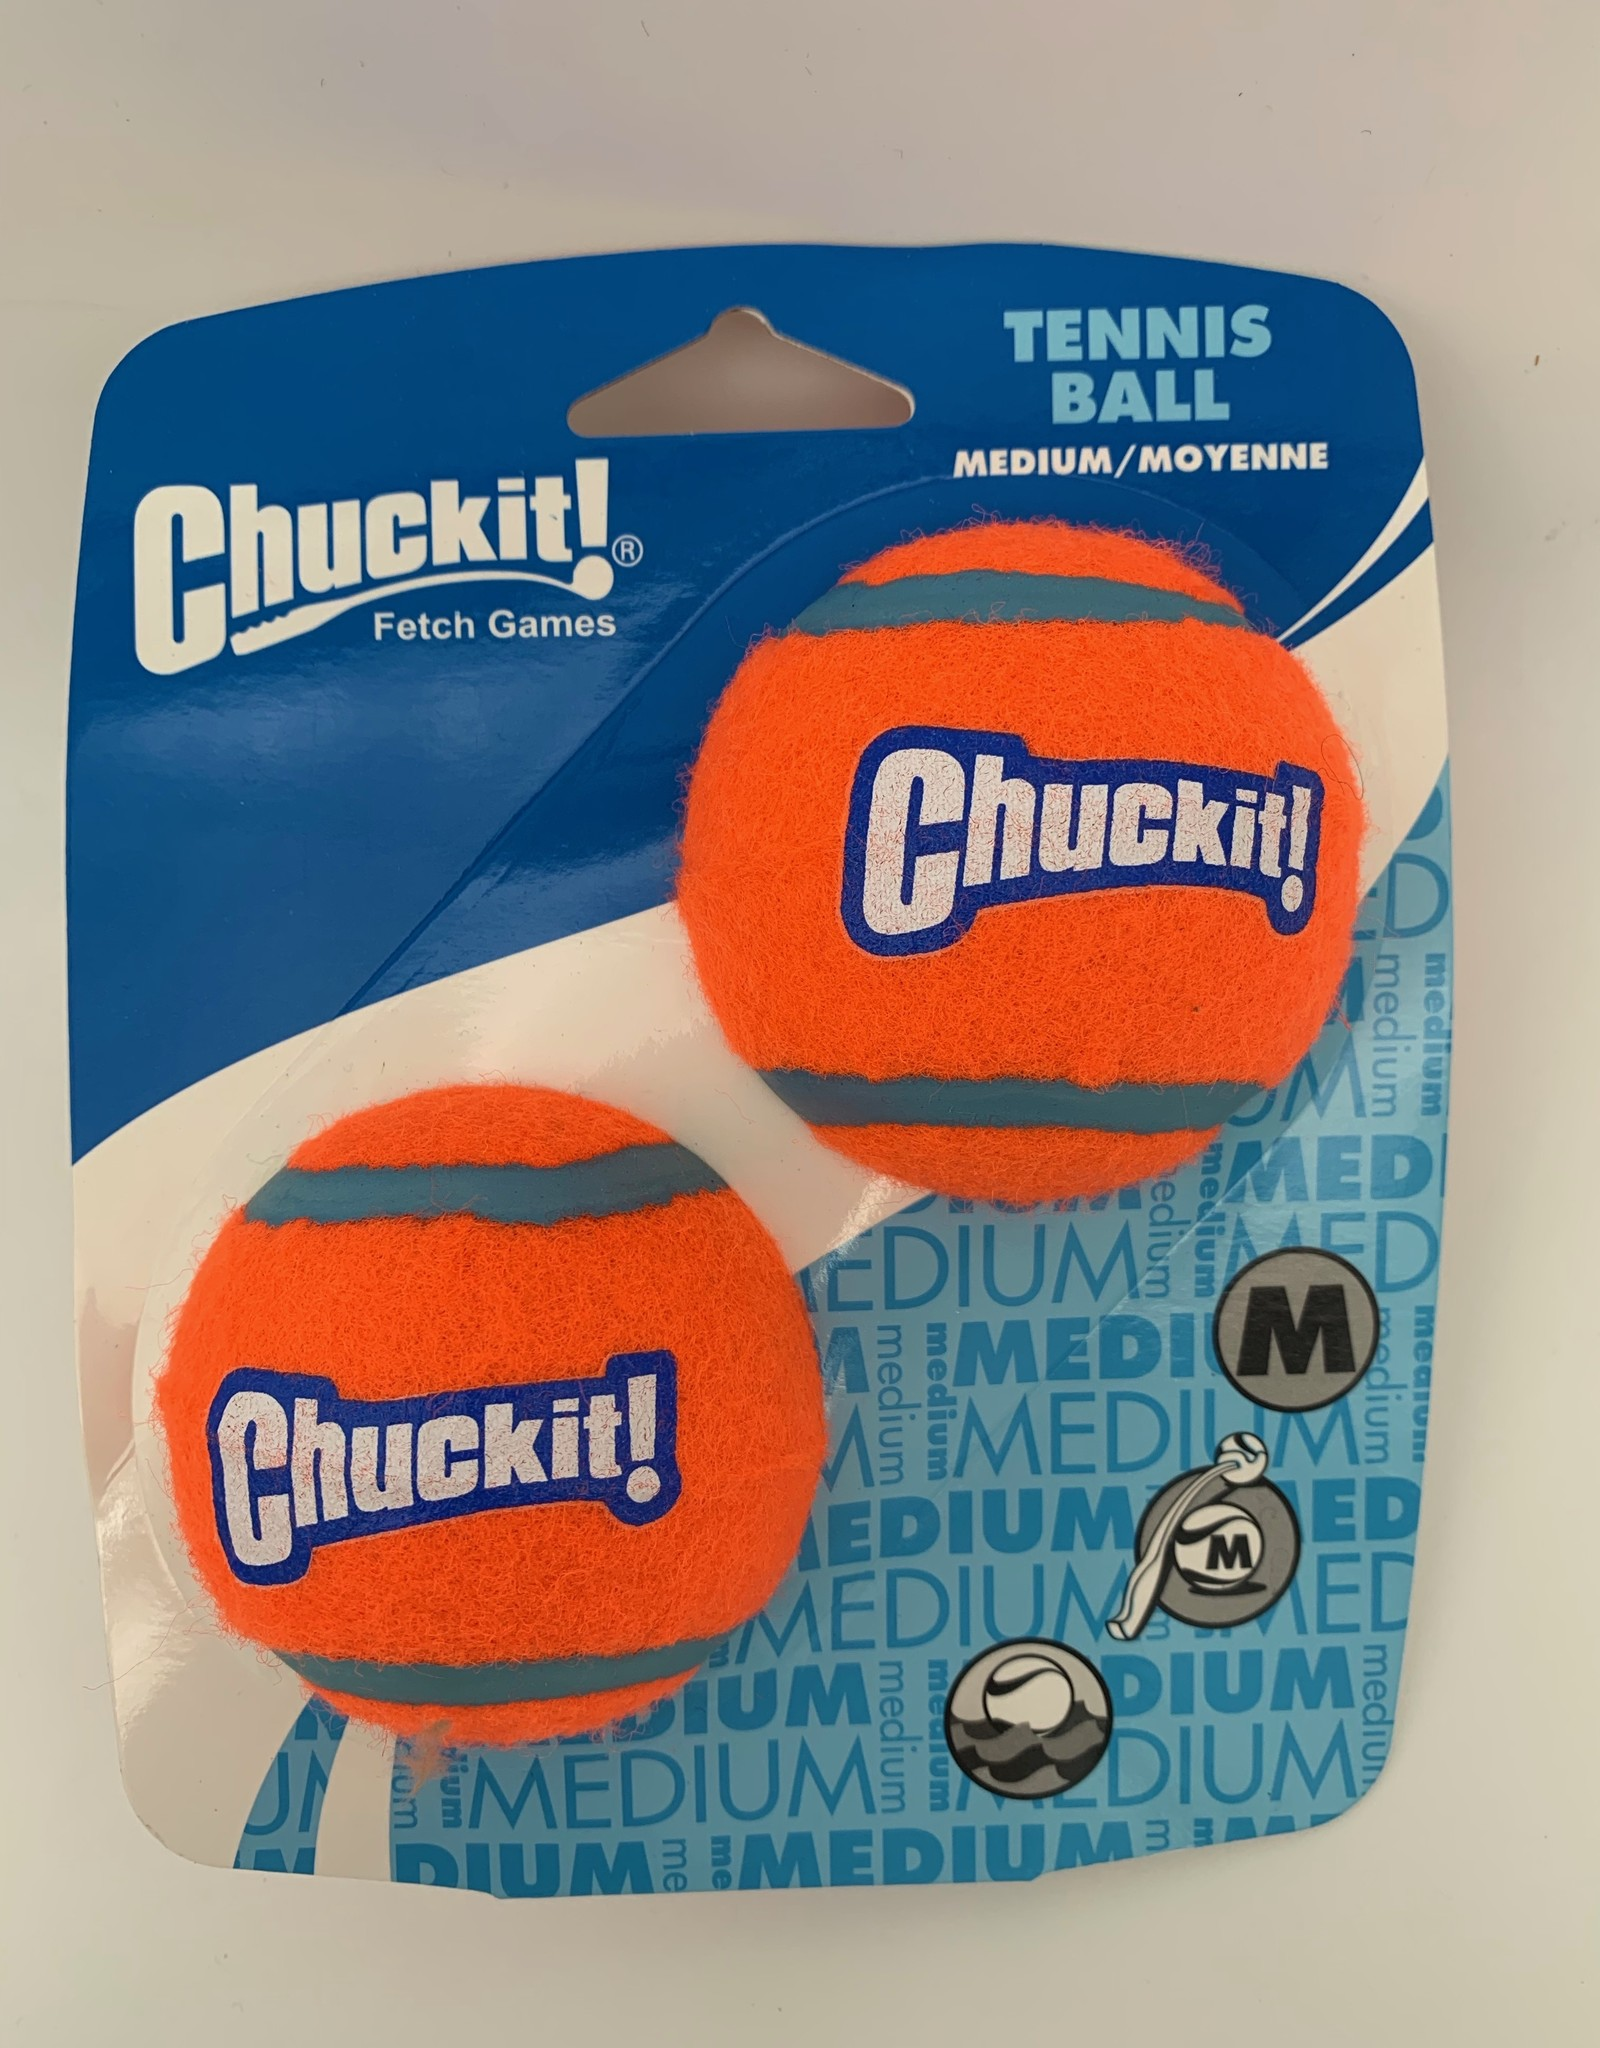 ChuckIt! Tennis Balls - Medium (2 pack)